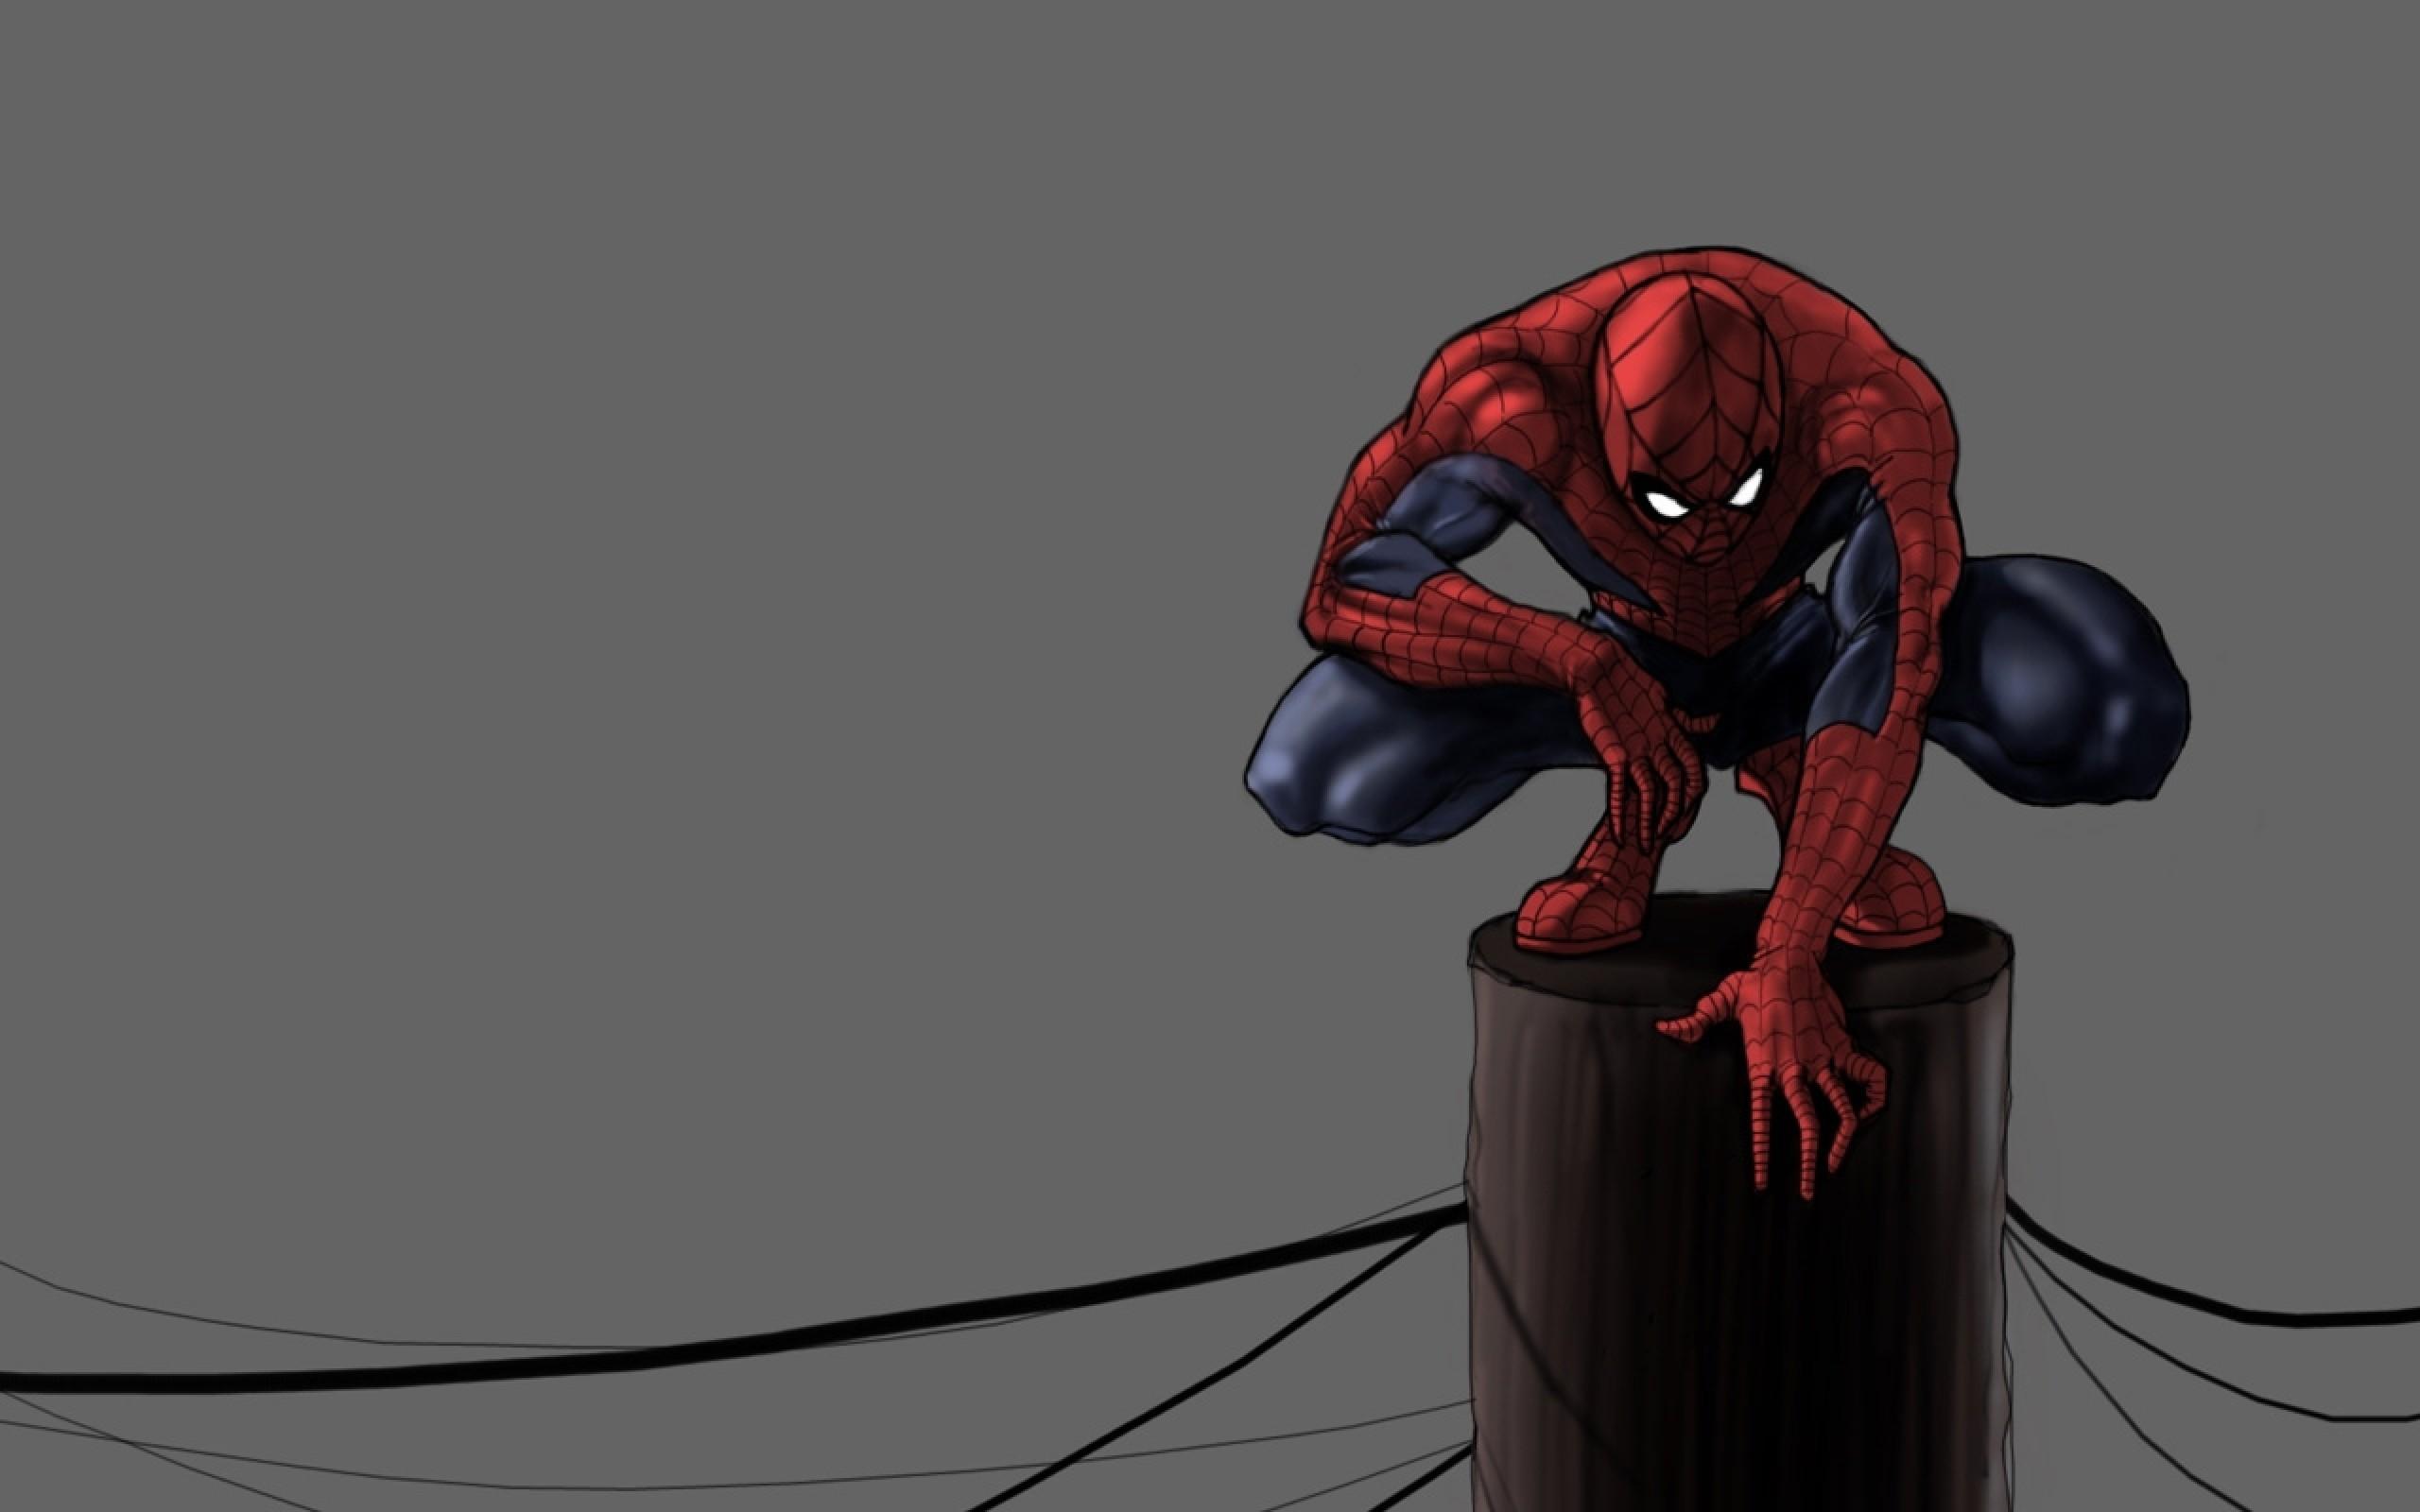 Cartoon Spiderman Squat on a Pole HD Grey Wallpaper Widescreen